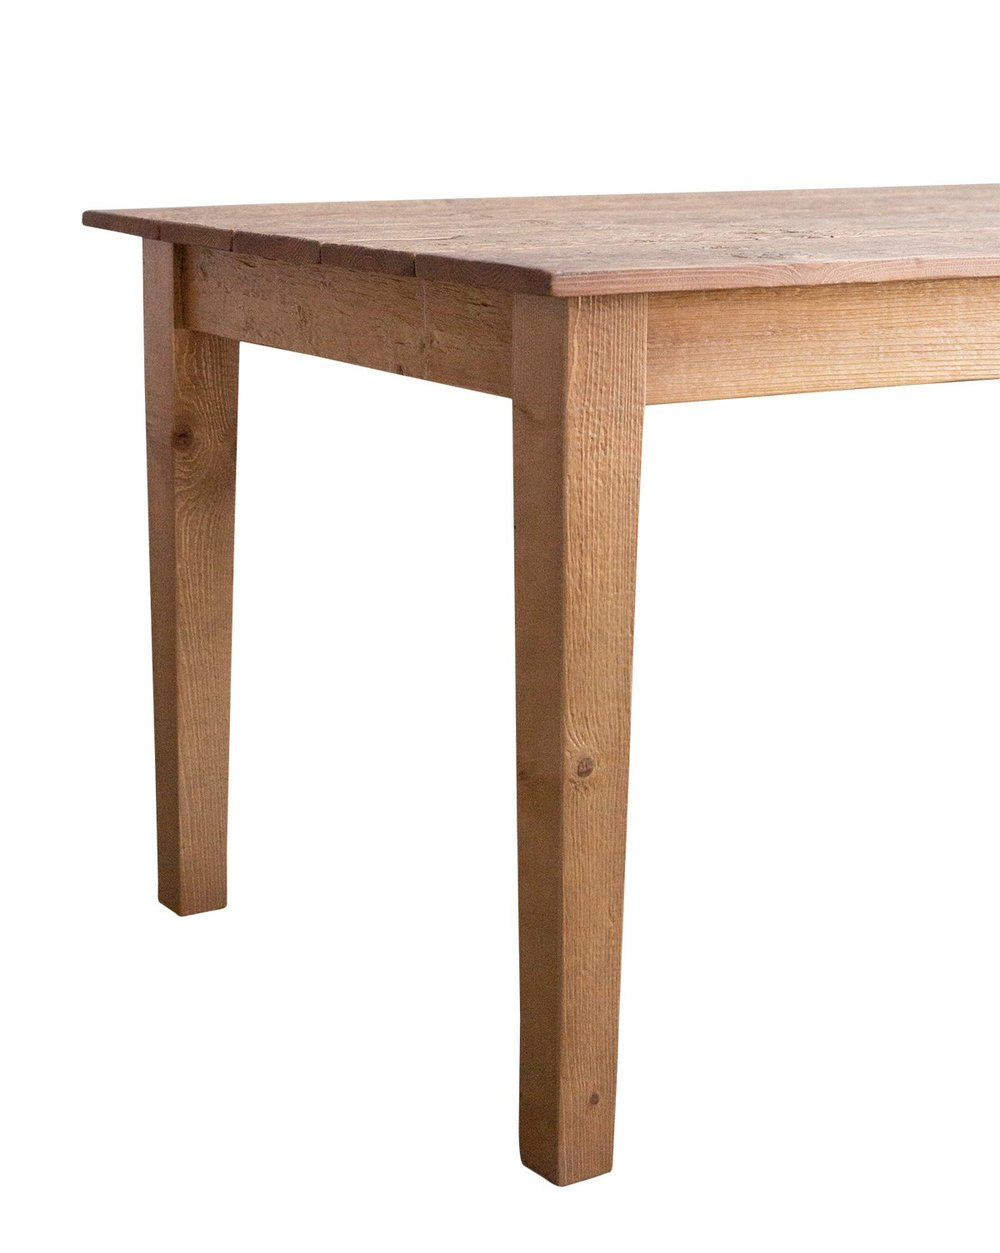 Fluer_Dining_Table2.jpg